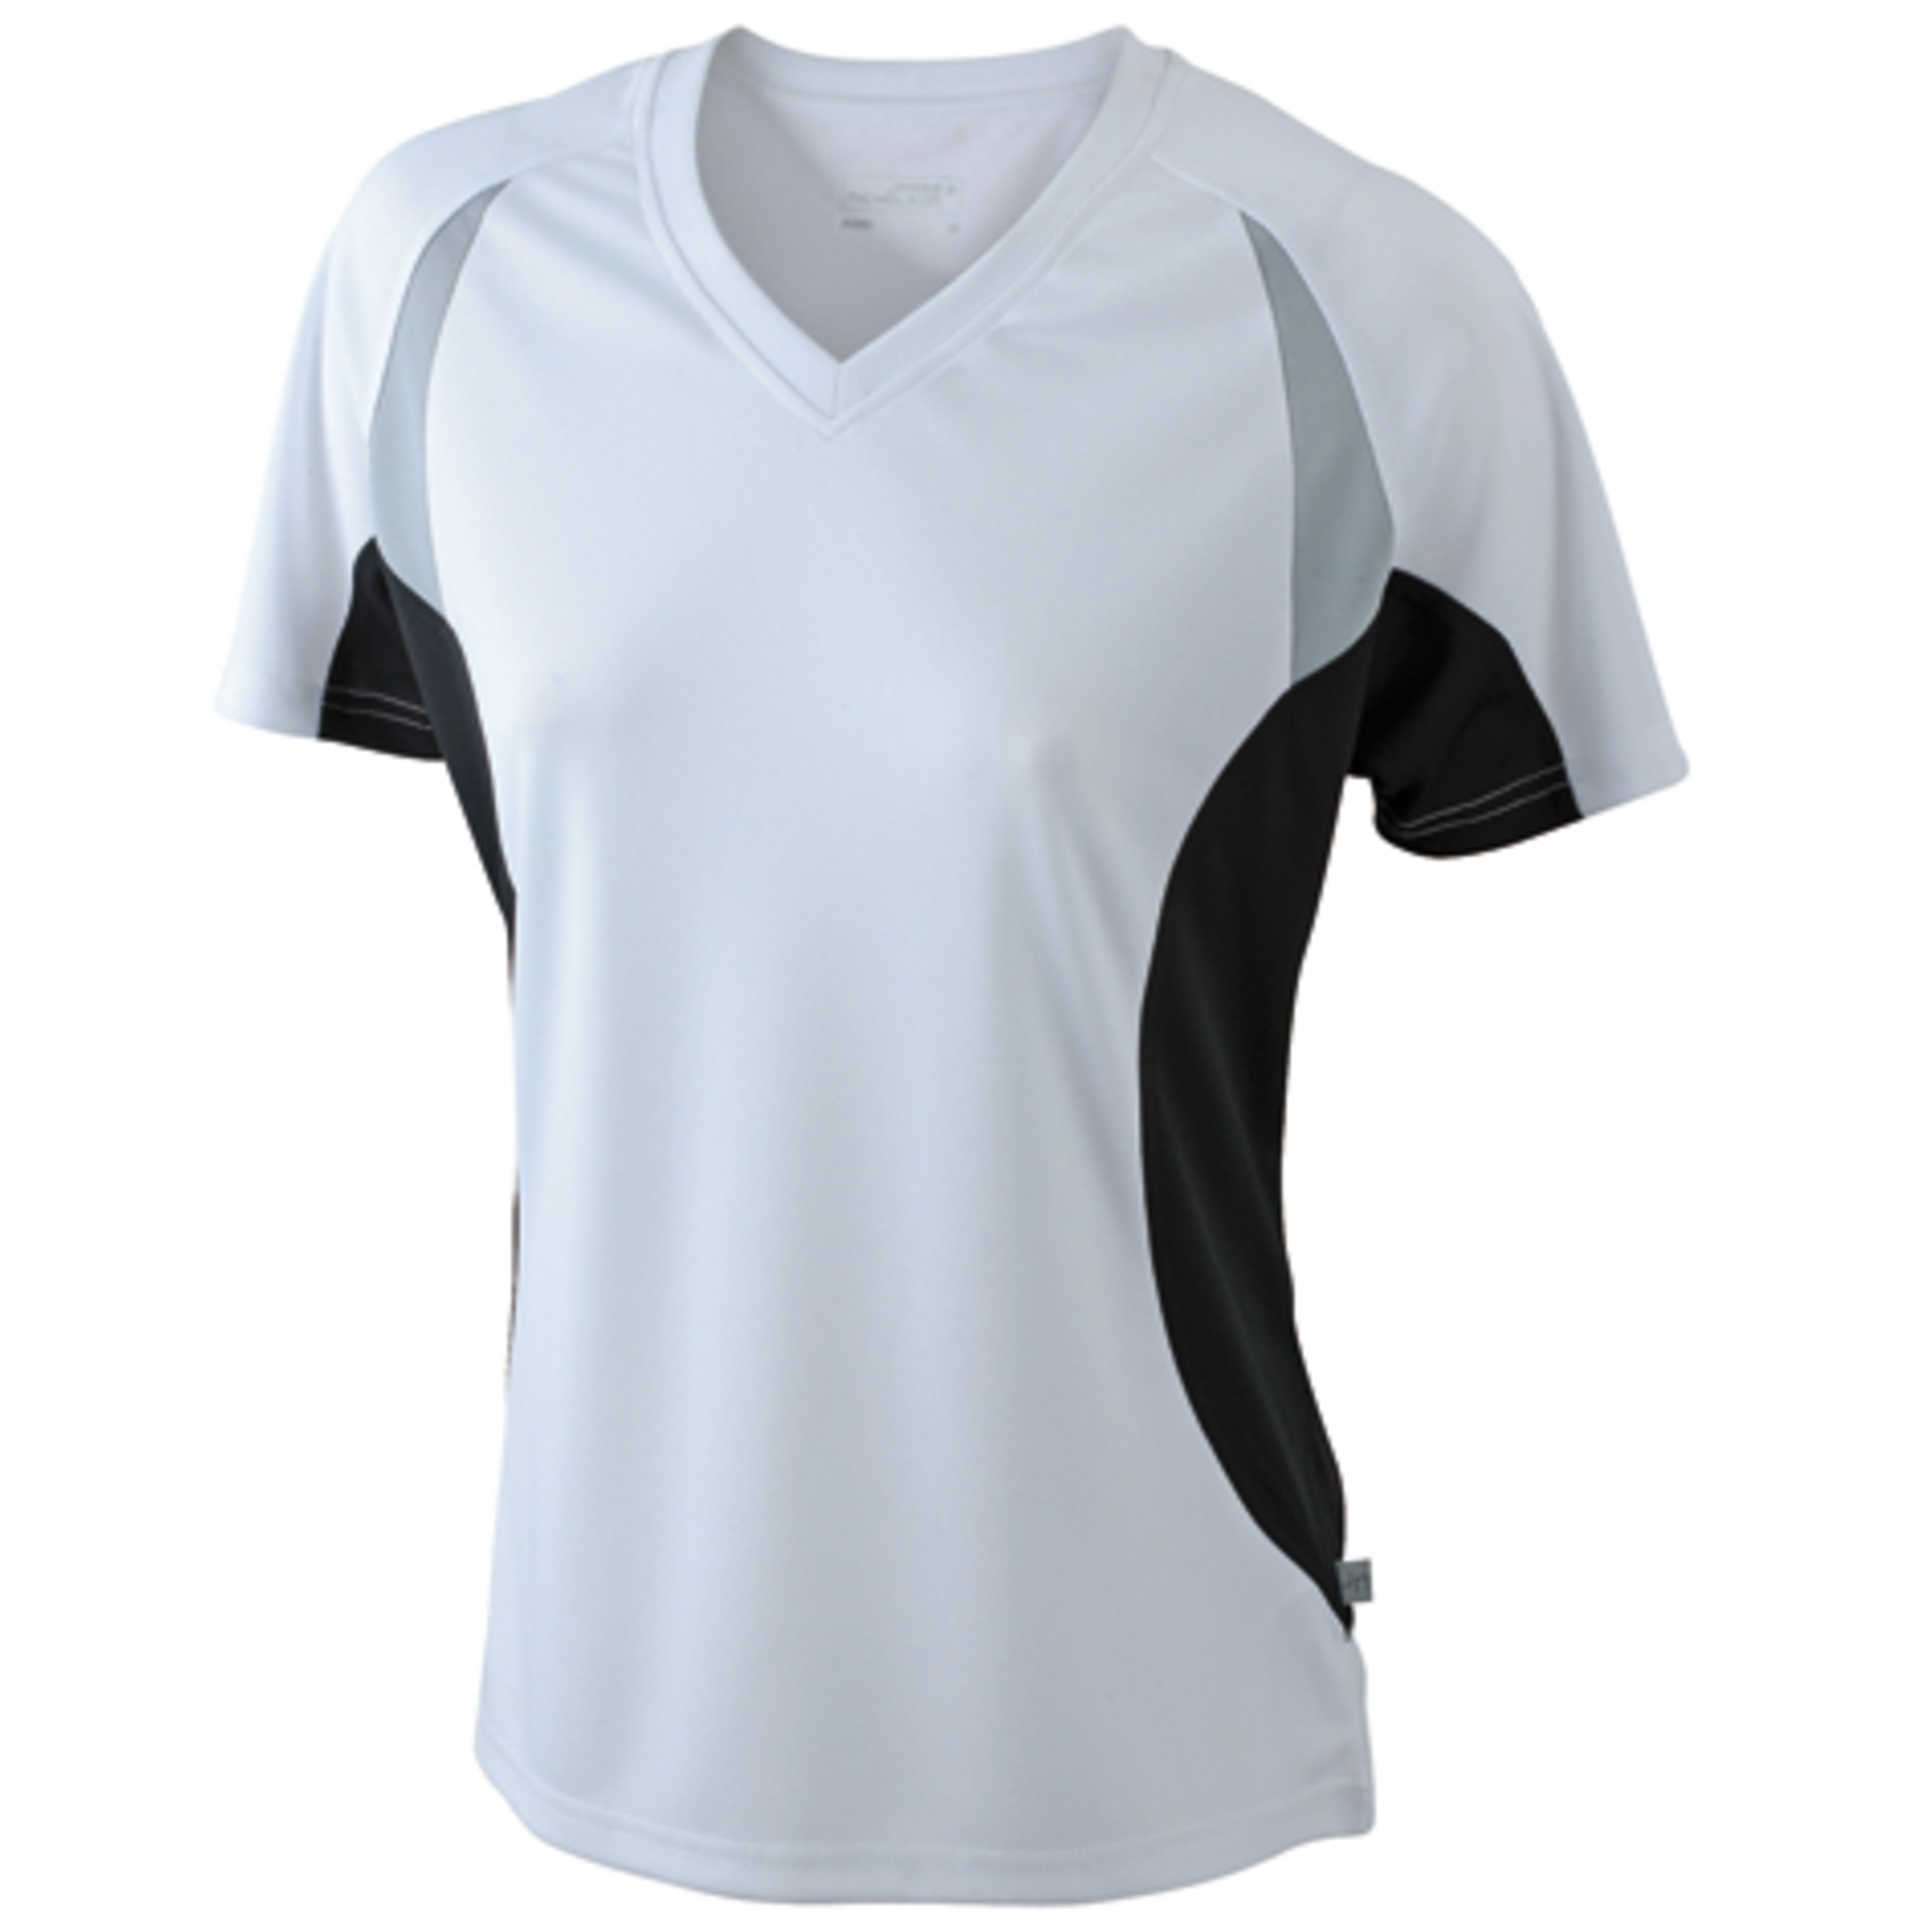 tee shirt personnalis ladies 39 running t james nicholson white black. Black Bedroom Furniture Sets. Home Design Ideas